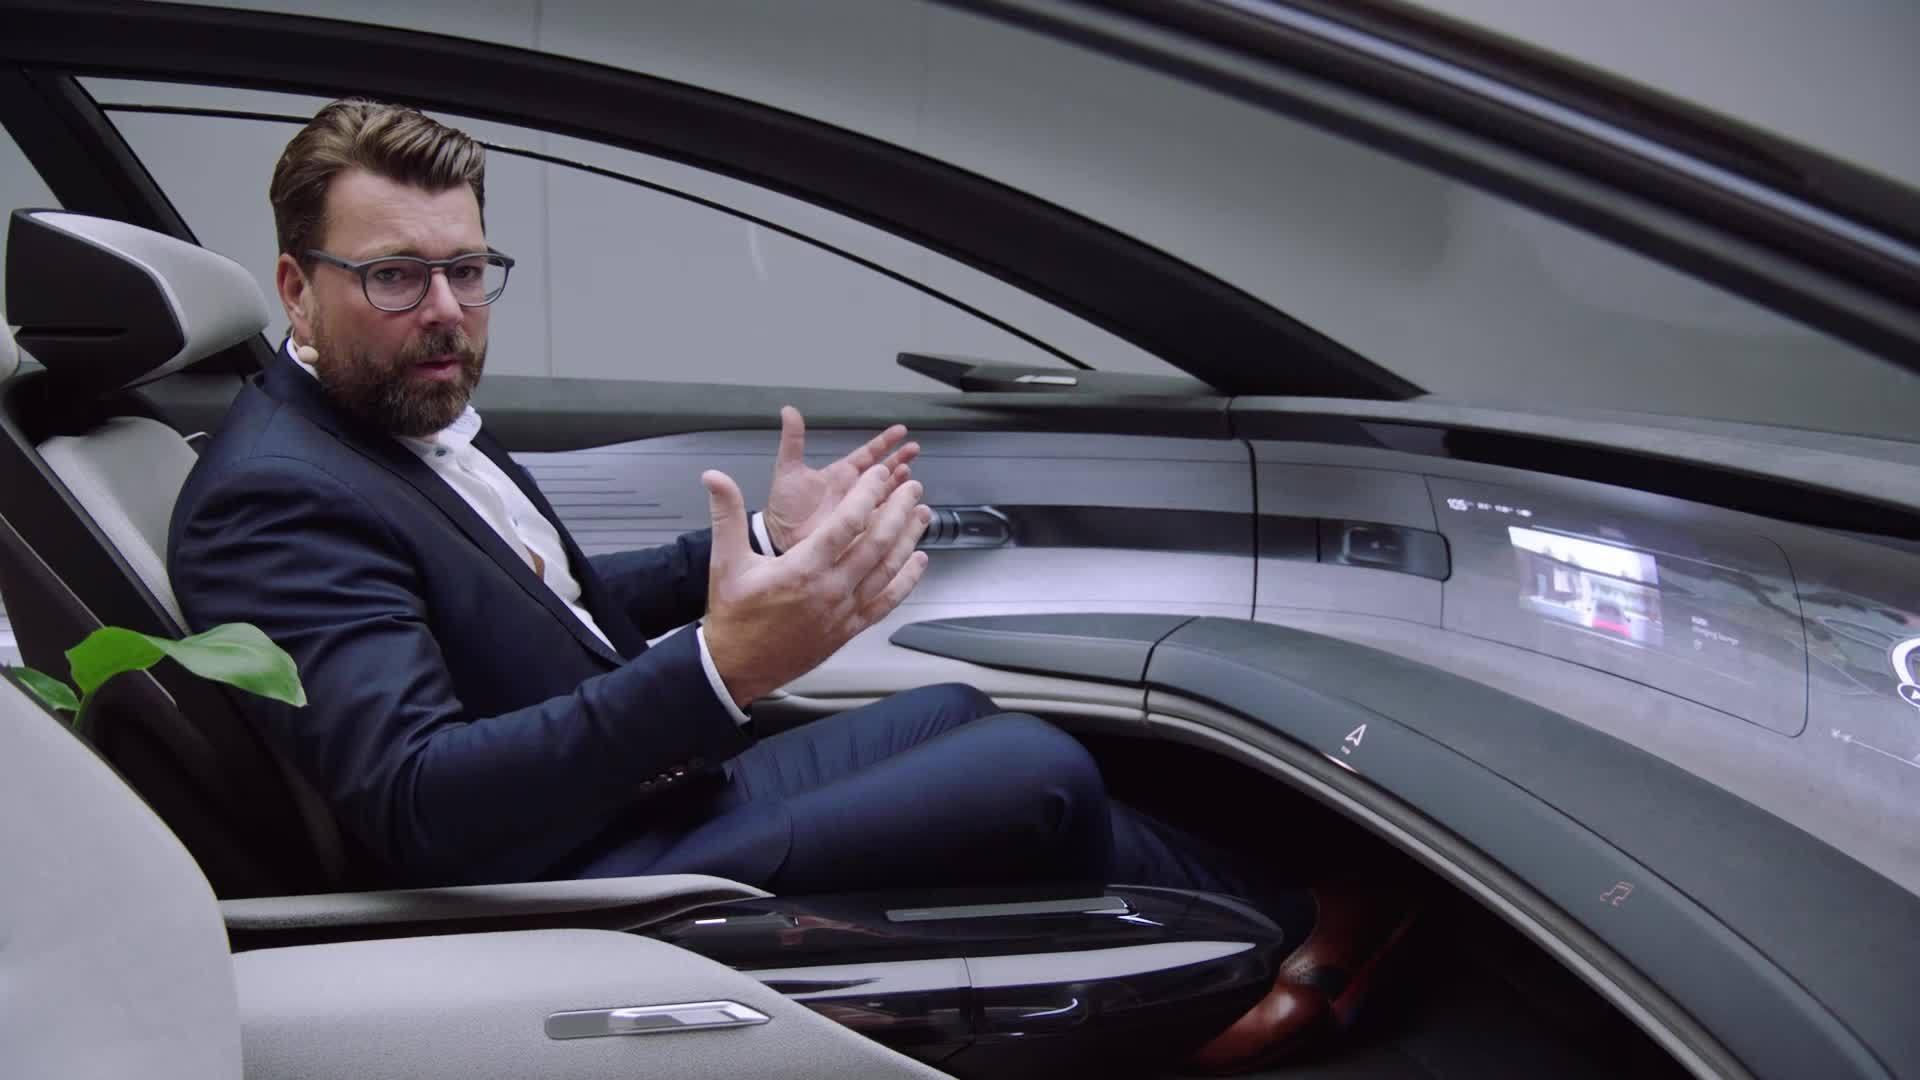 Oliver Hoffmann präsentiert den neuen Audi grandsphere concept